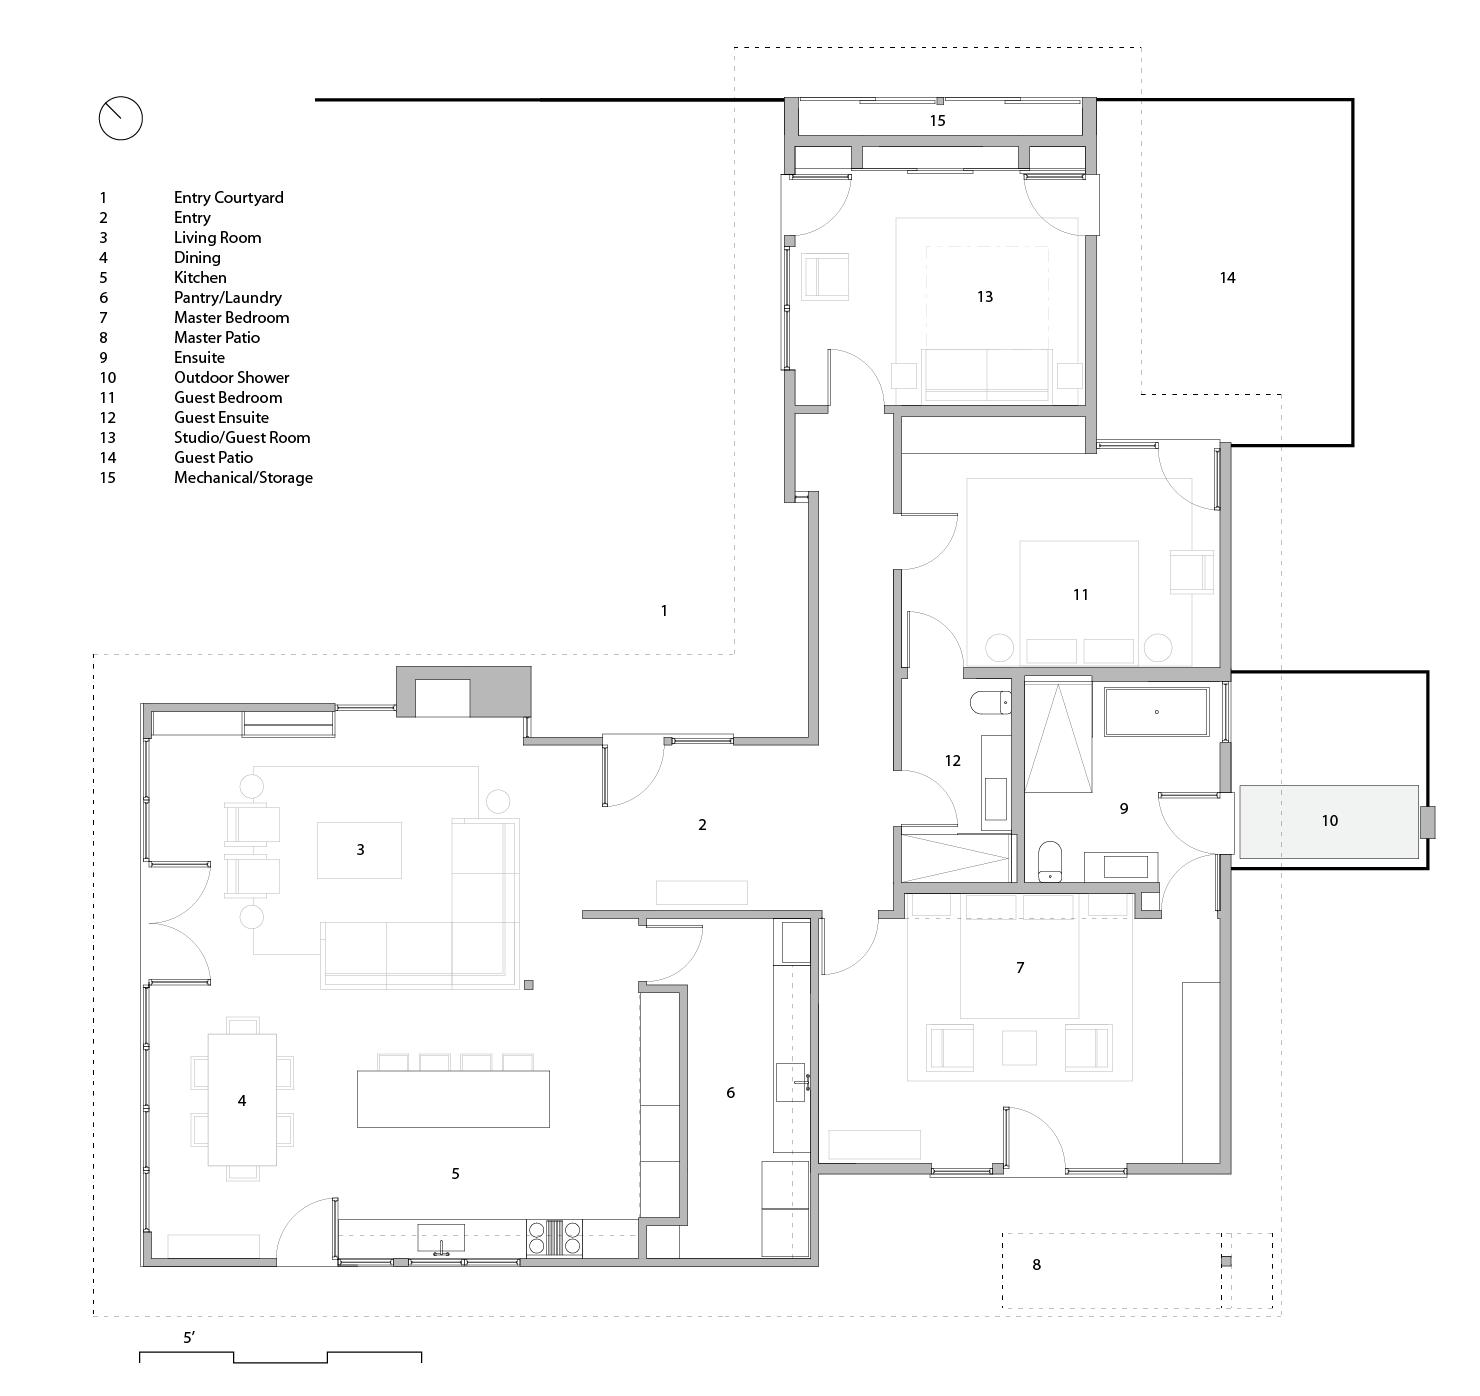 vista-grande-floorplan.png